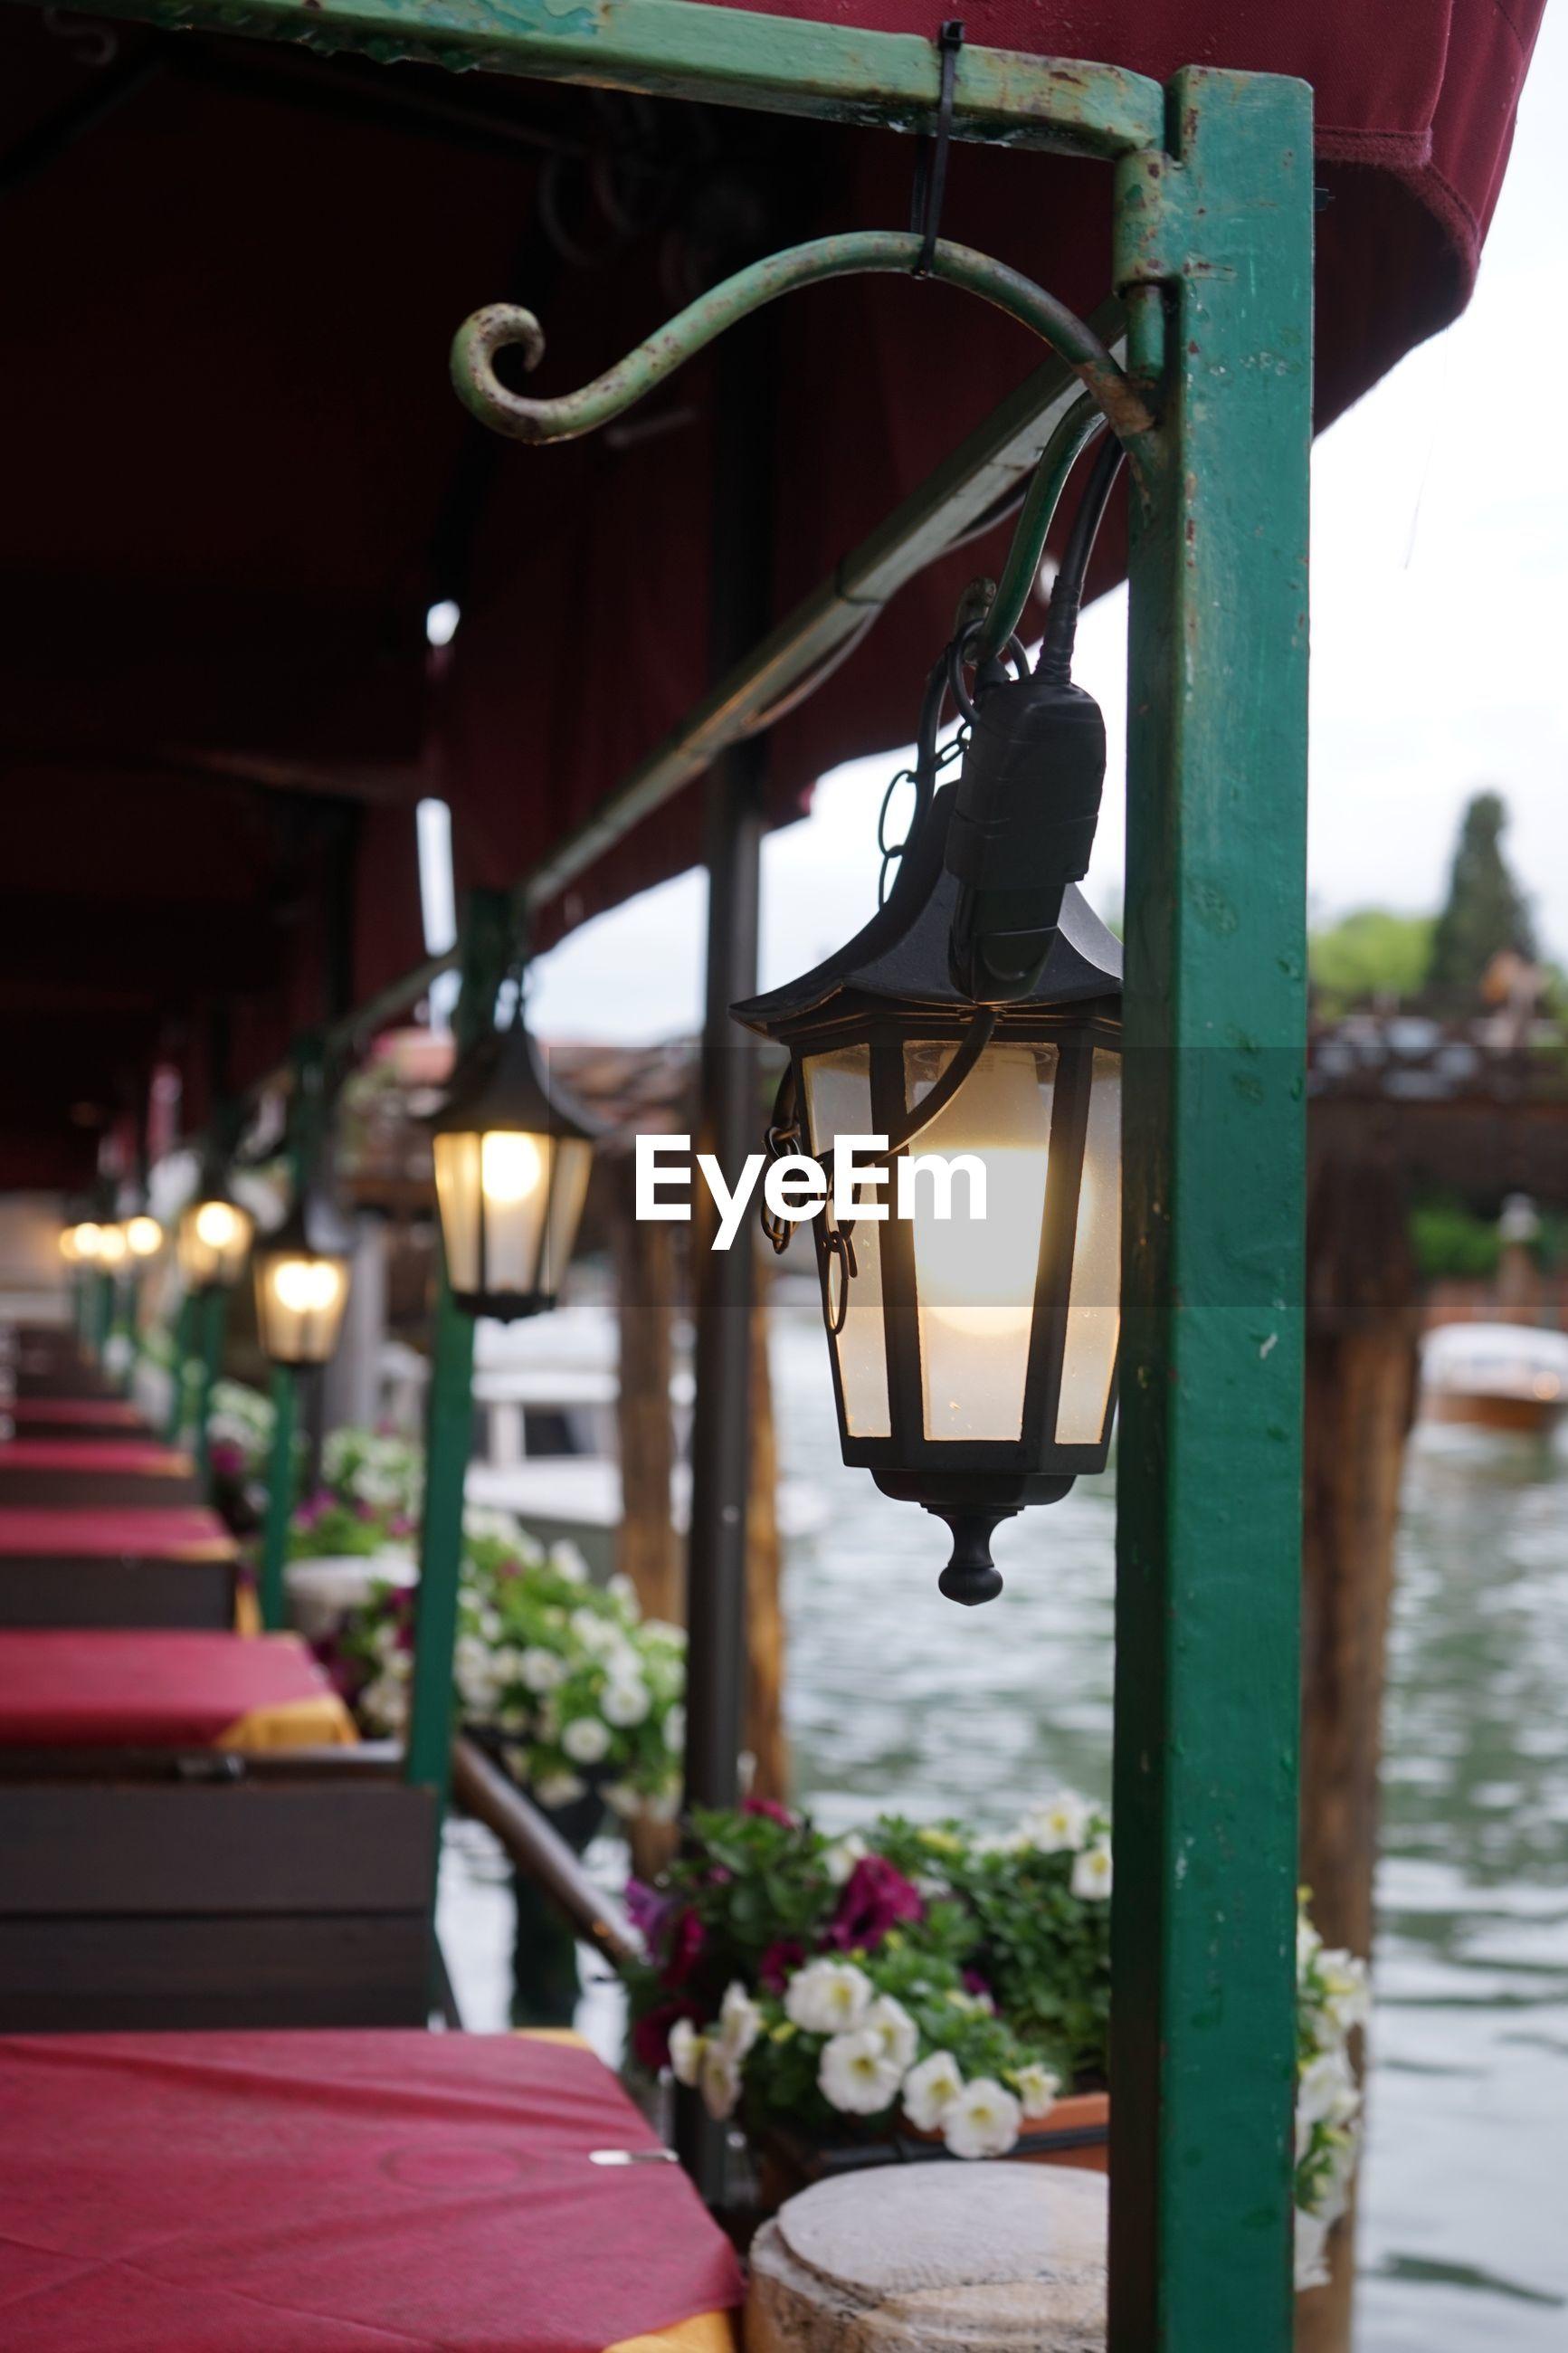 CLOSE-UP OF ILLUMINATED LAMP HANGING BY STREET LIGHT